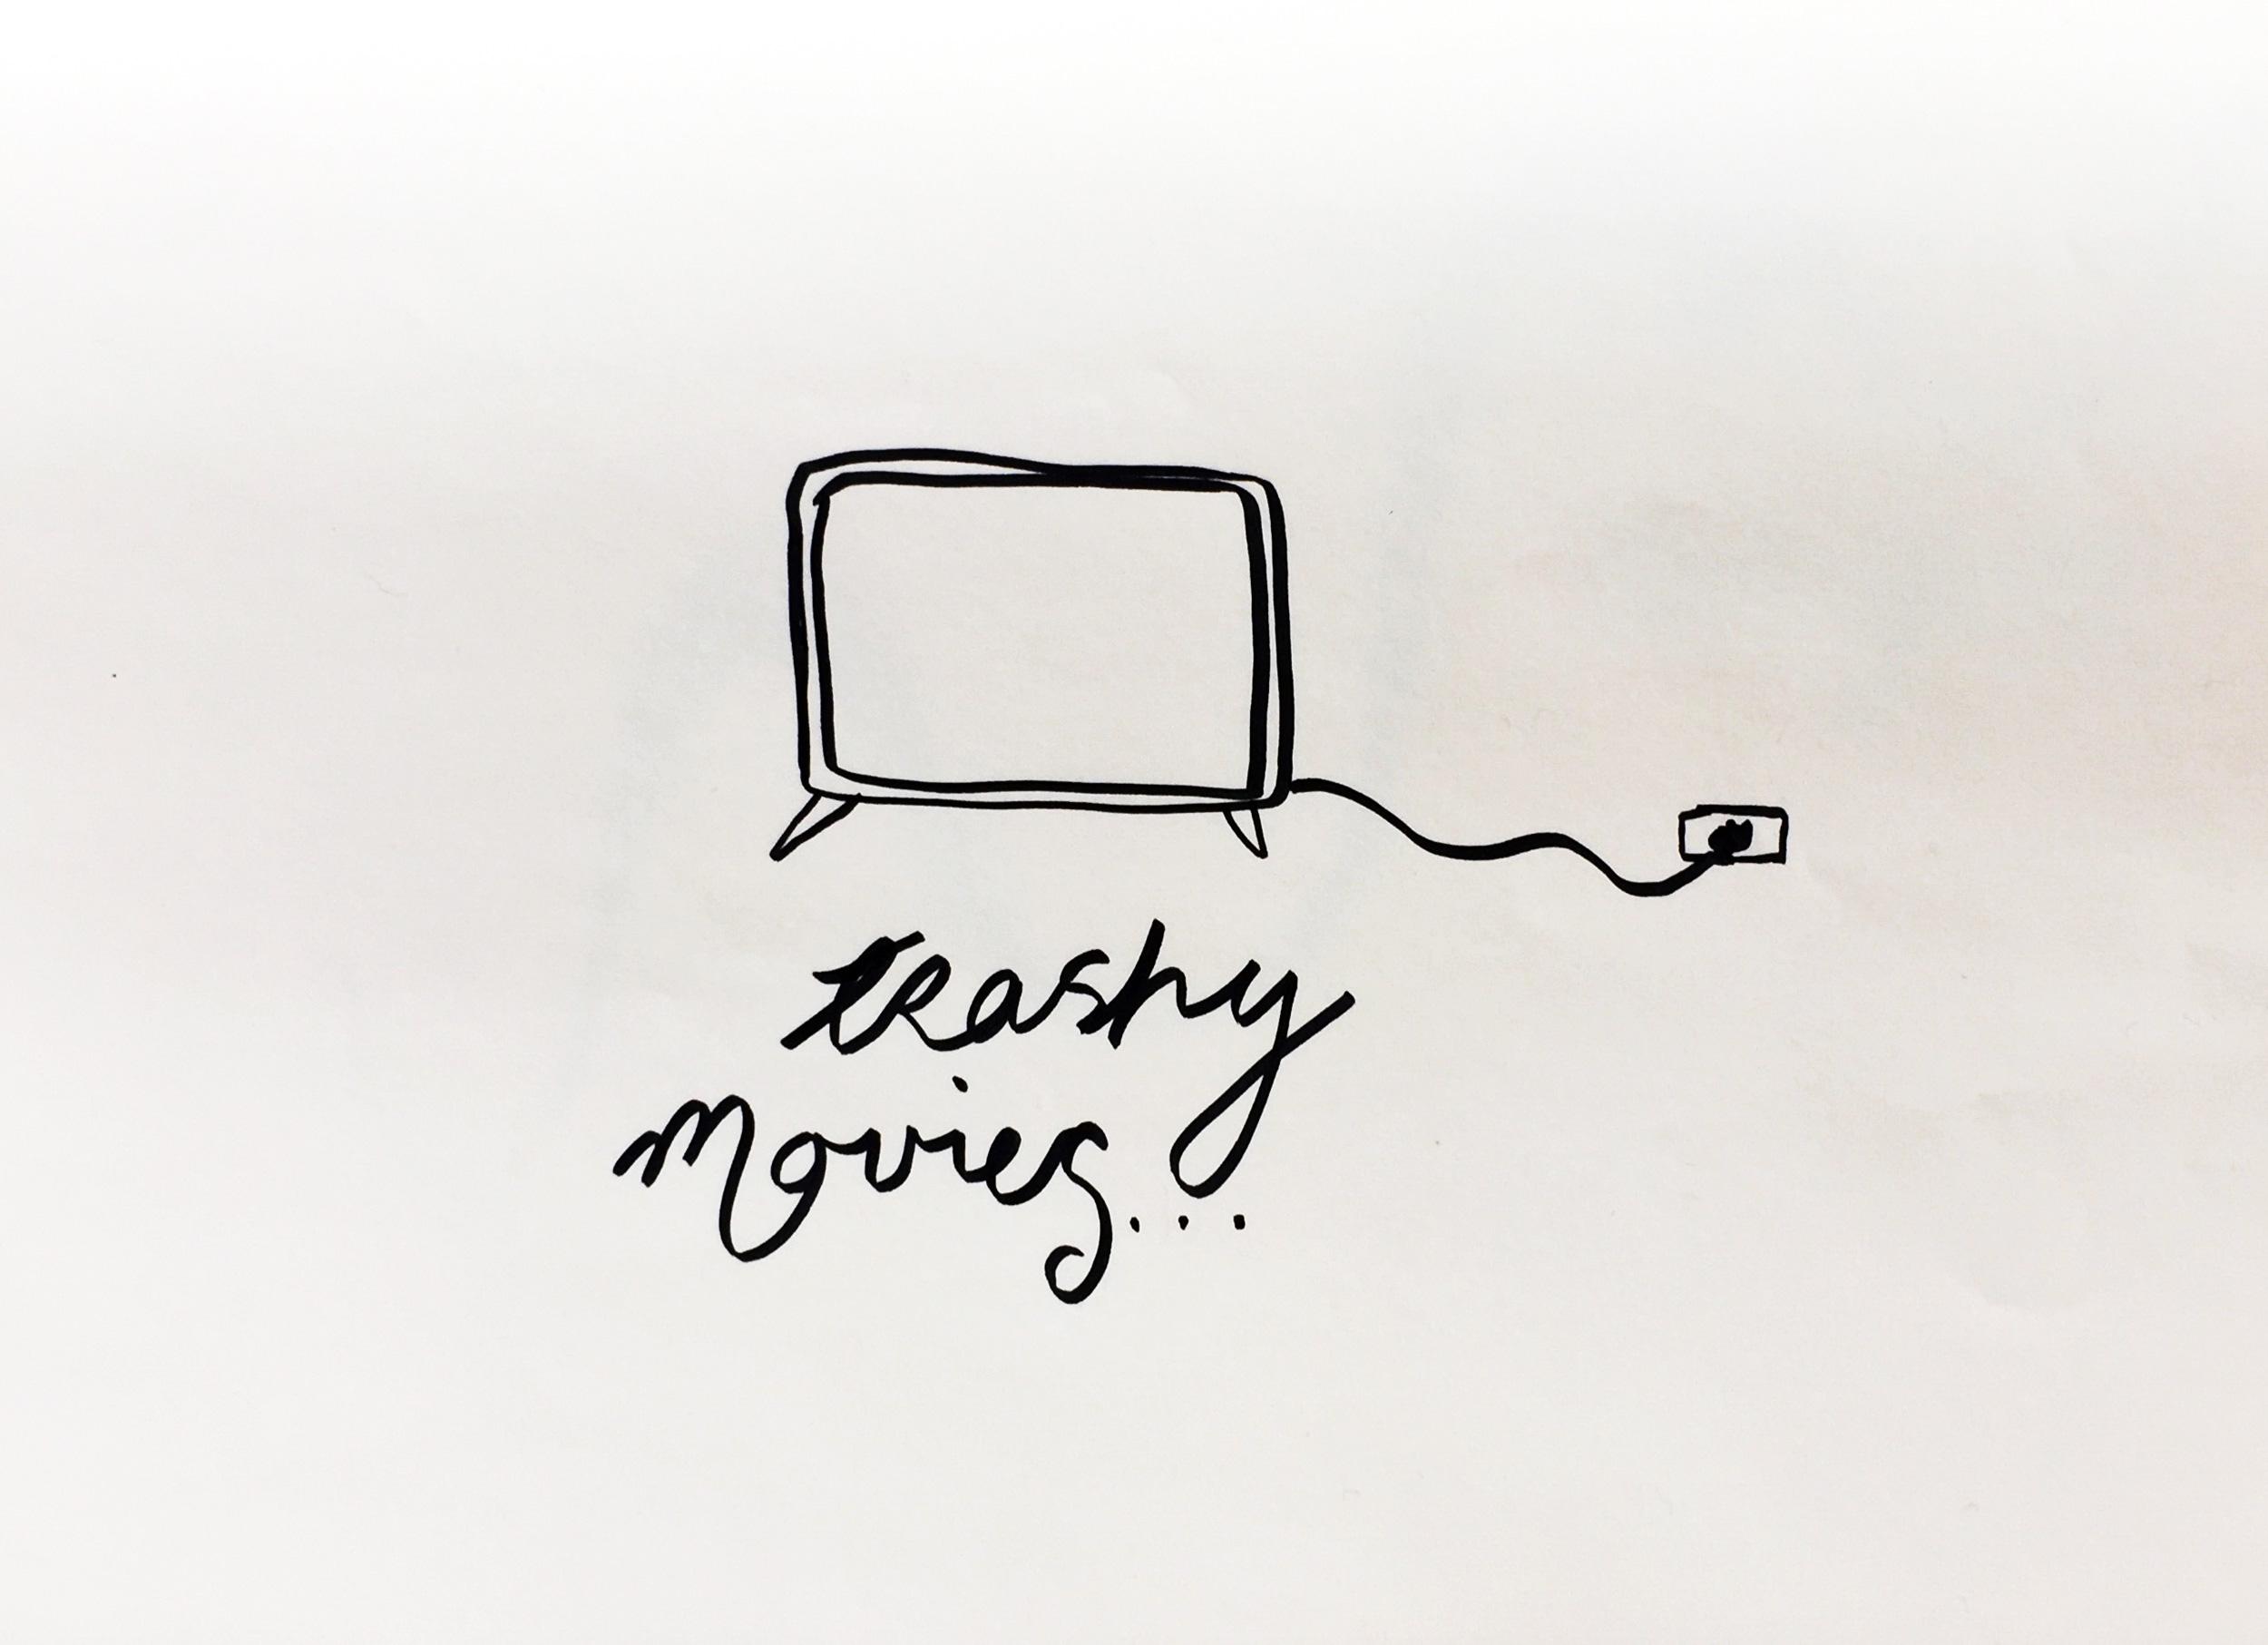 Trashy movies. Drawing Luke Hockley.